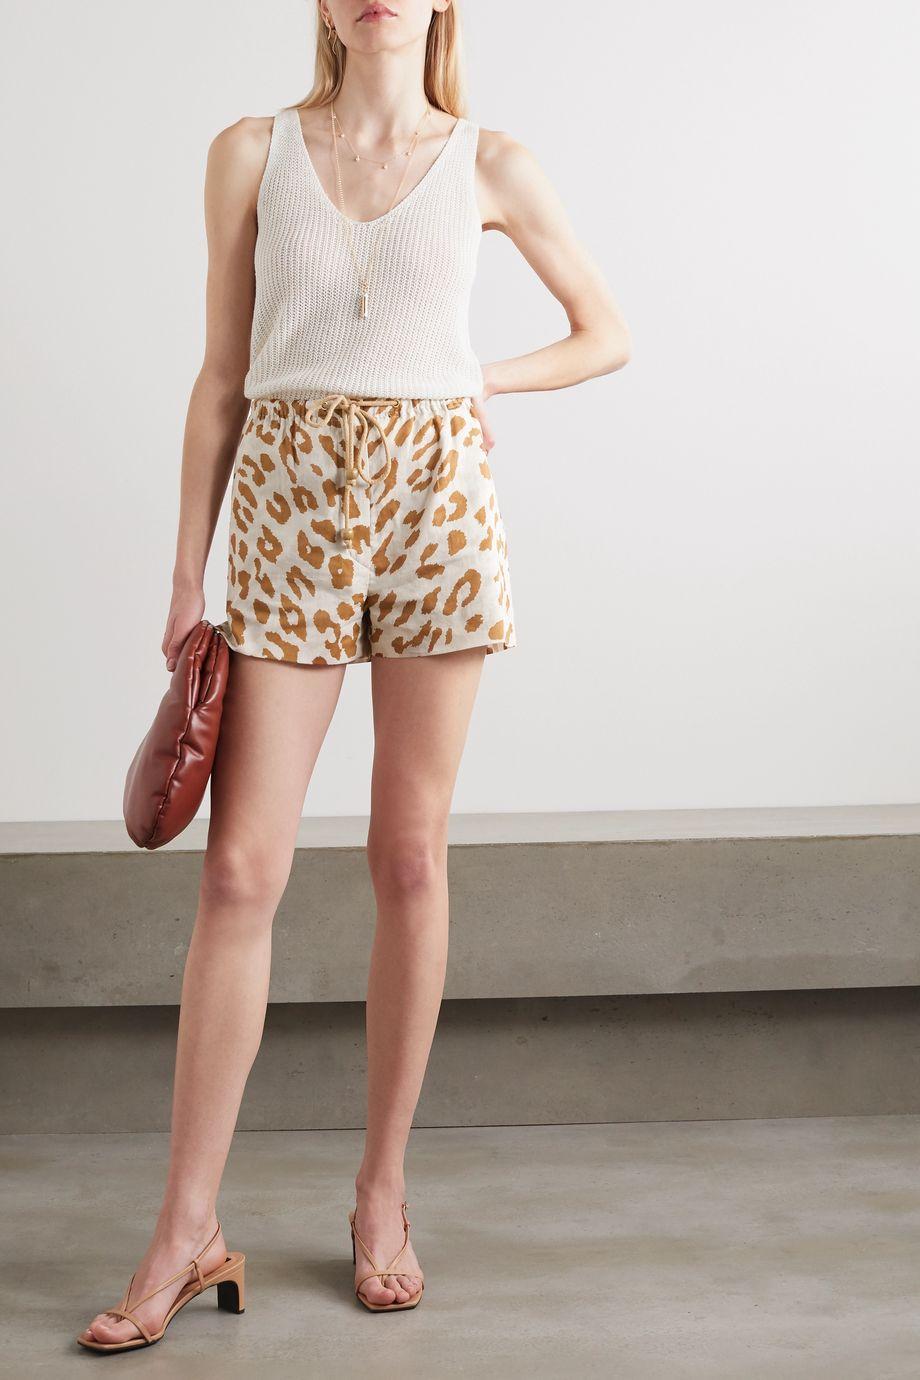 Nanushka Febe 豹纹有机纯棉巴里纱短裤